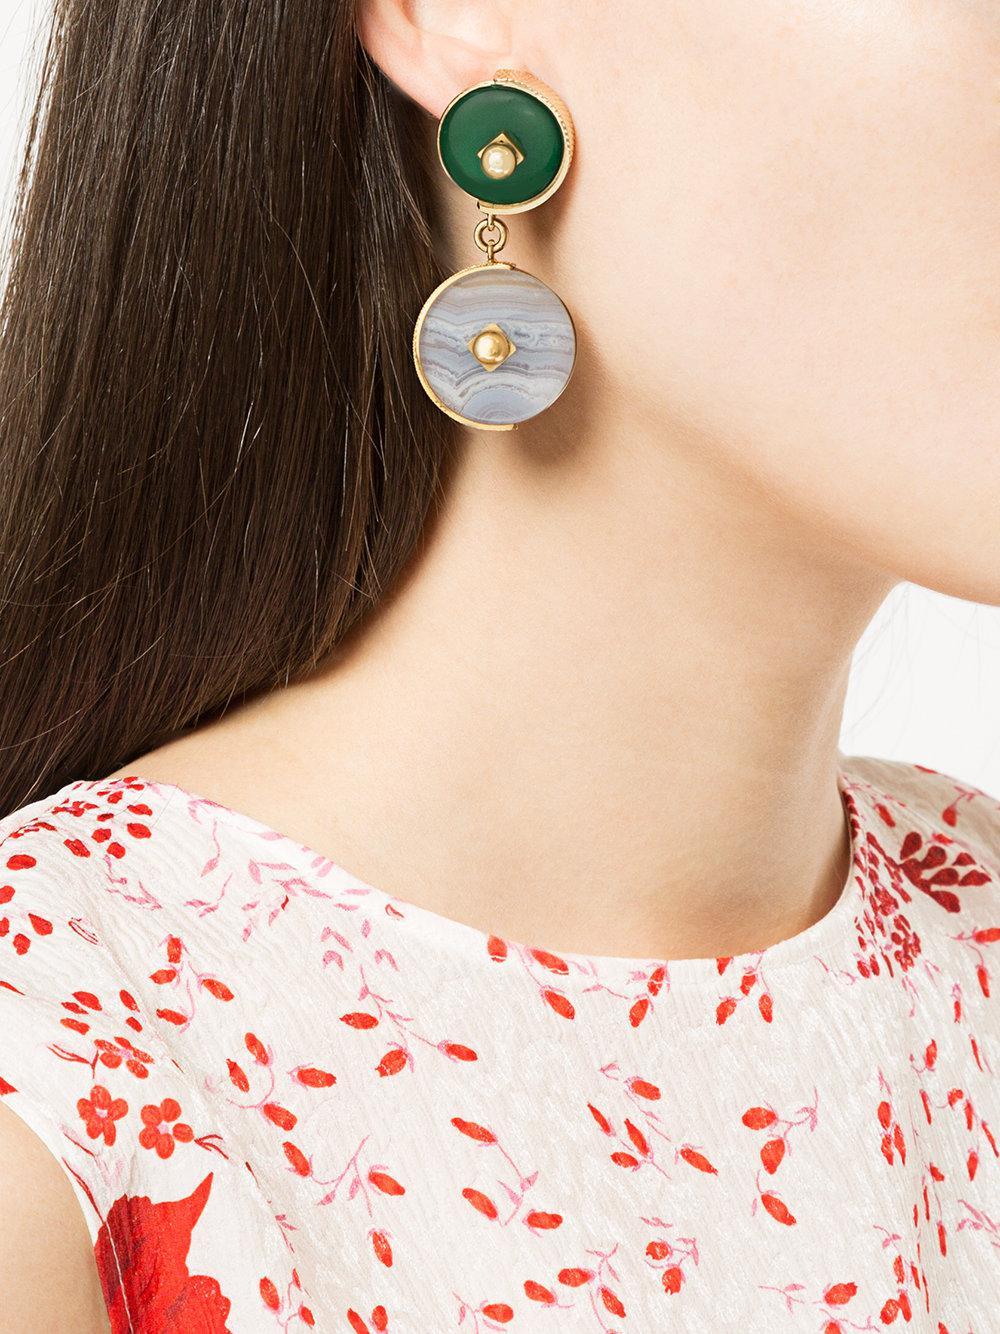 Crystalline Lace Agate earrings - Green ZT3Ym4M